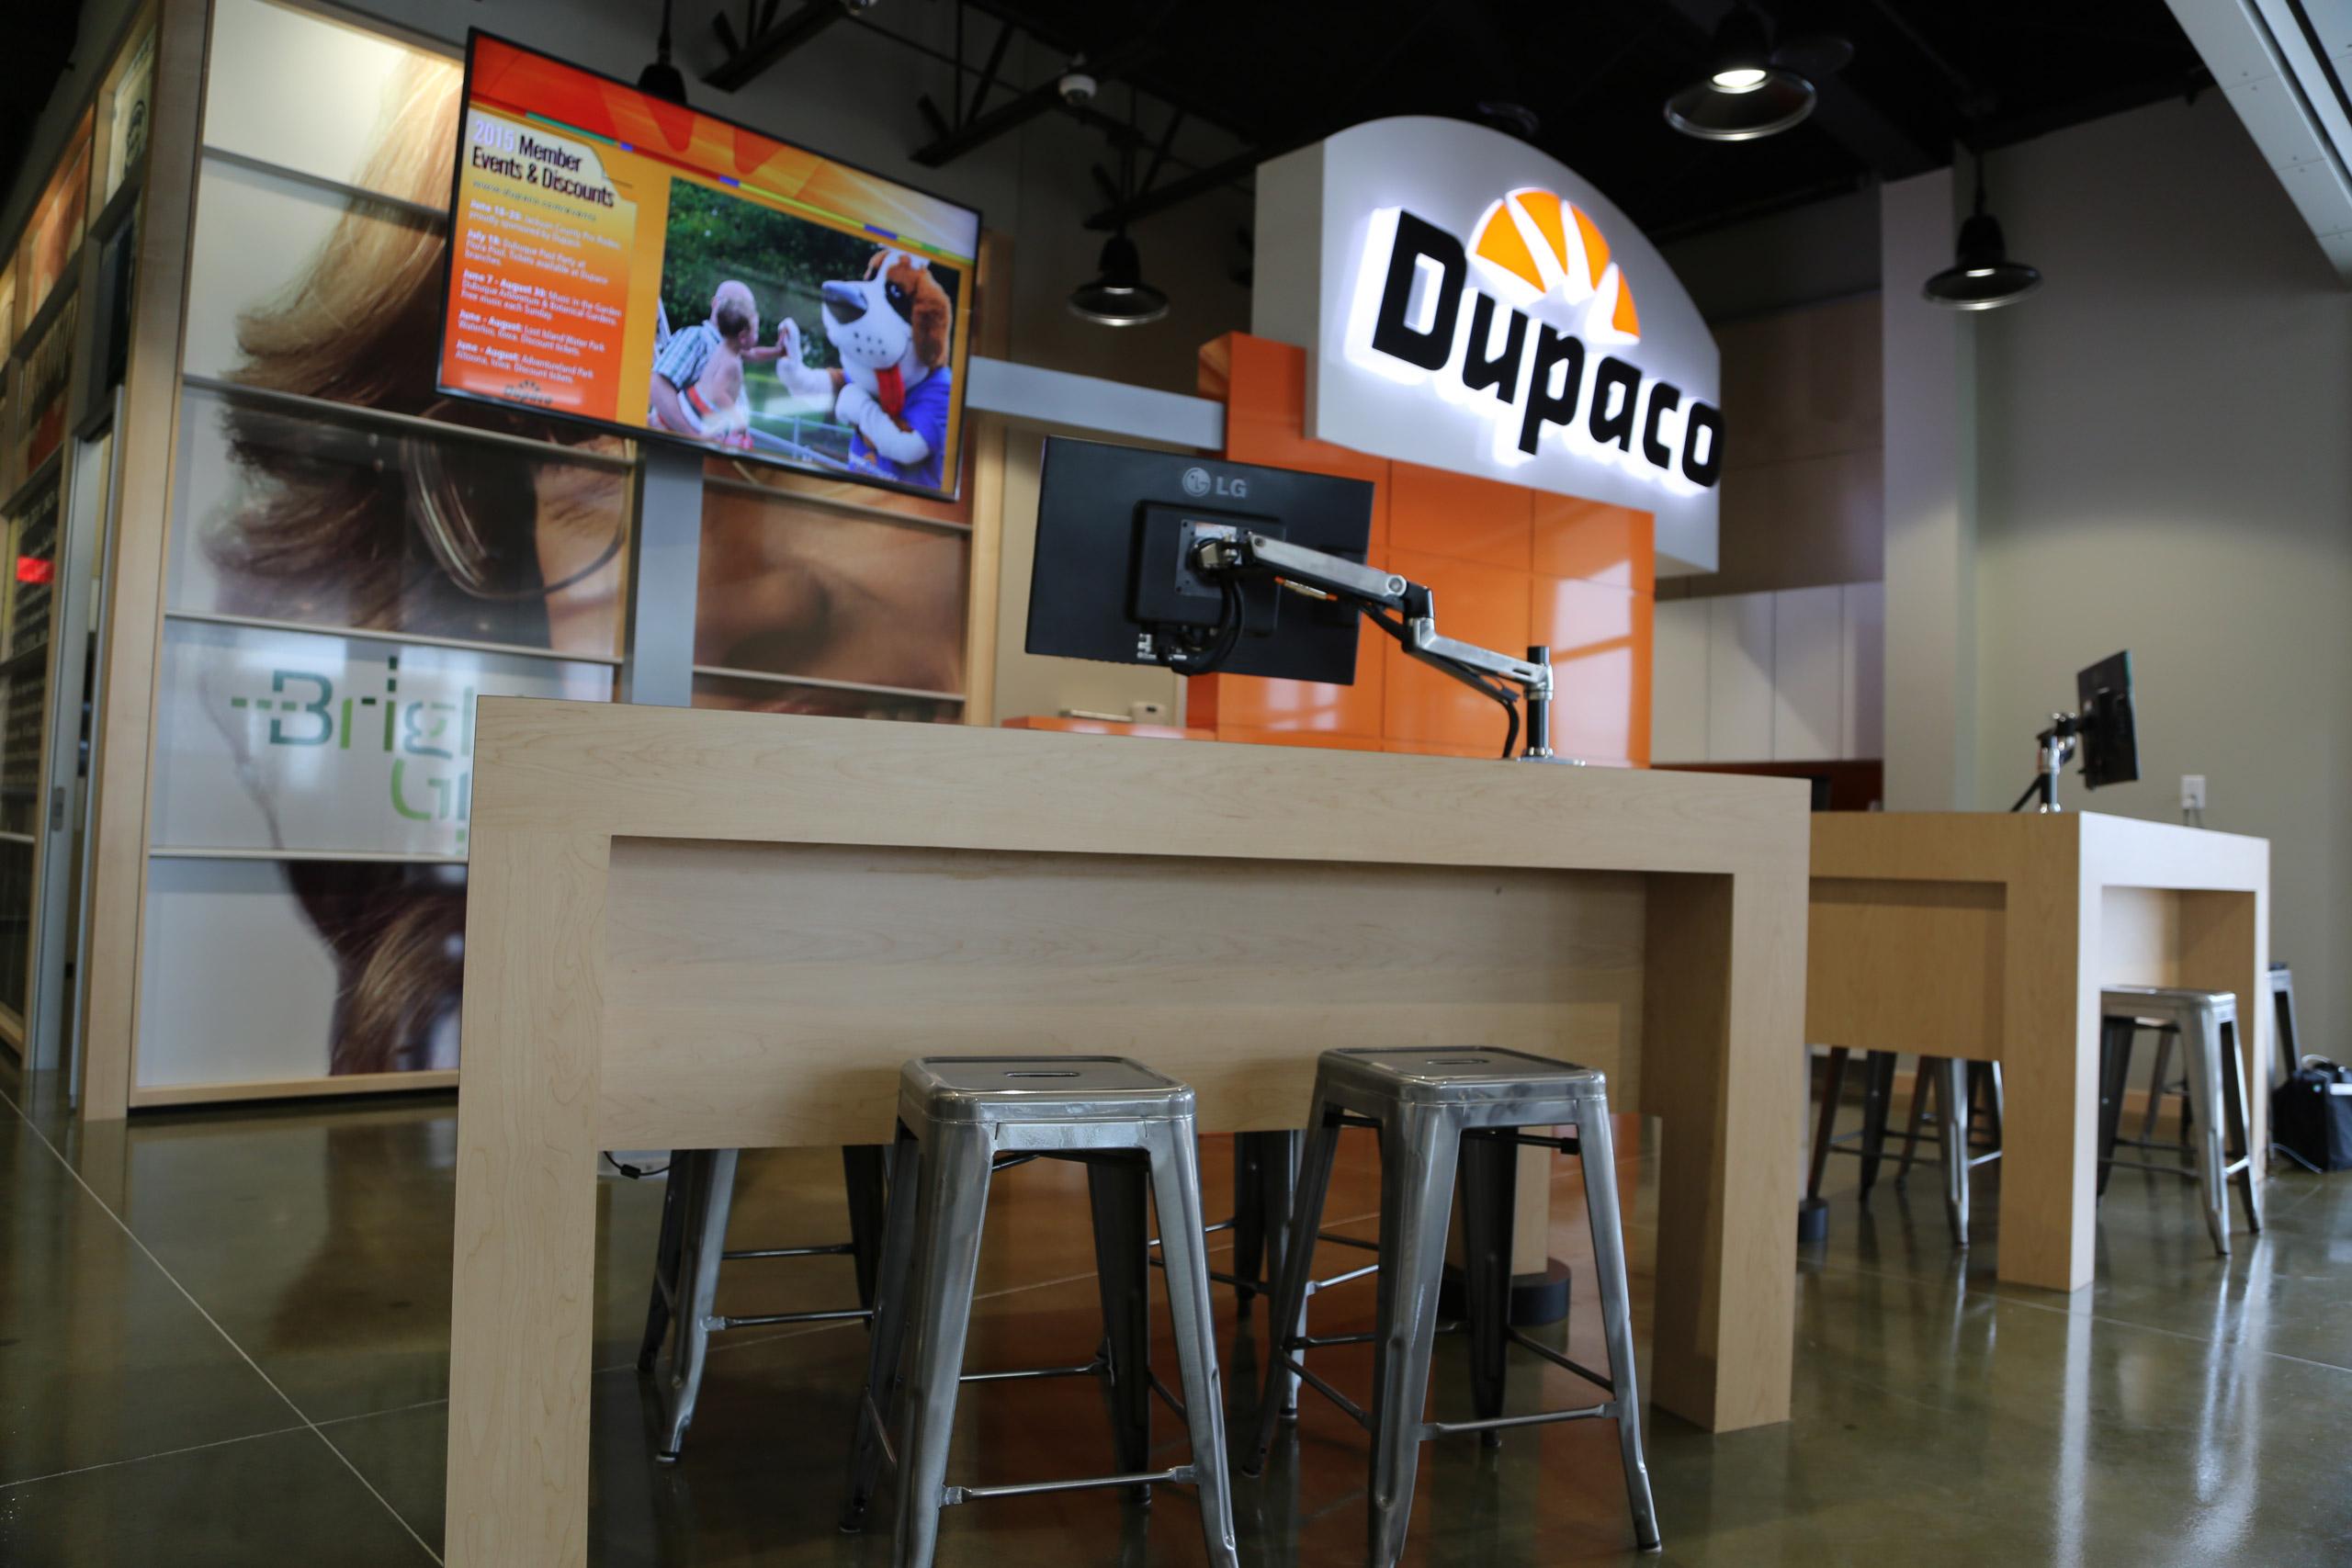 Dupaco Corporate Environment Teller Station